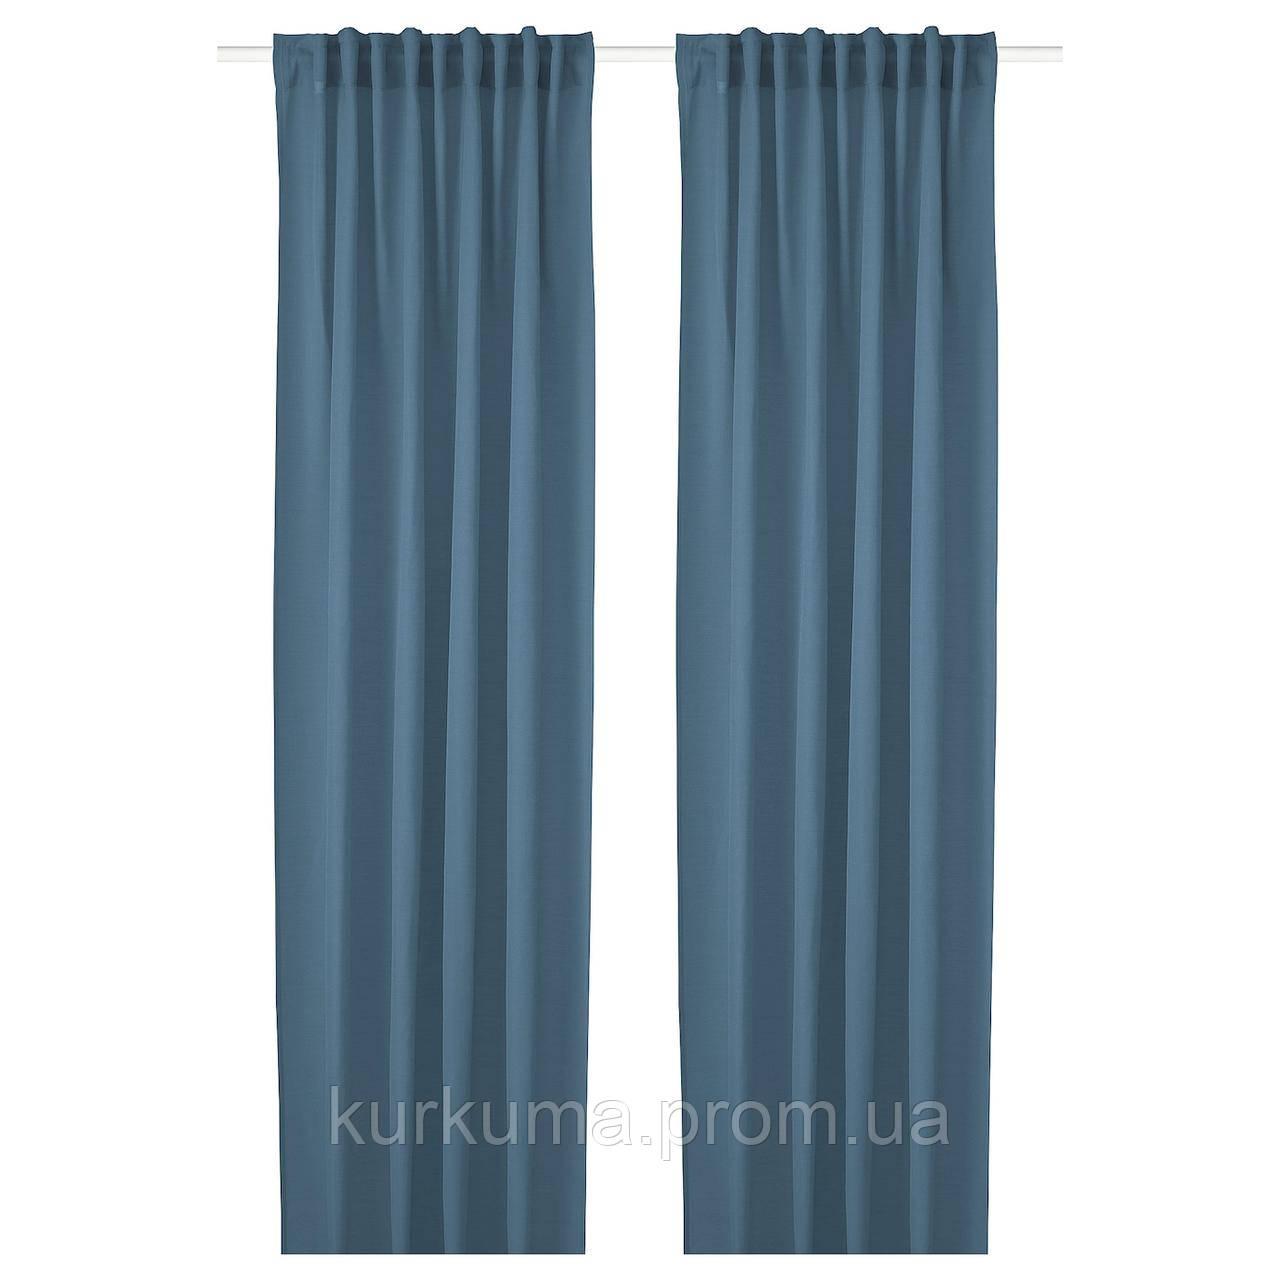 IKEA HILJA Гардины, 2 шт., синий, 145x300 см (904.630.29)